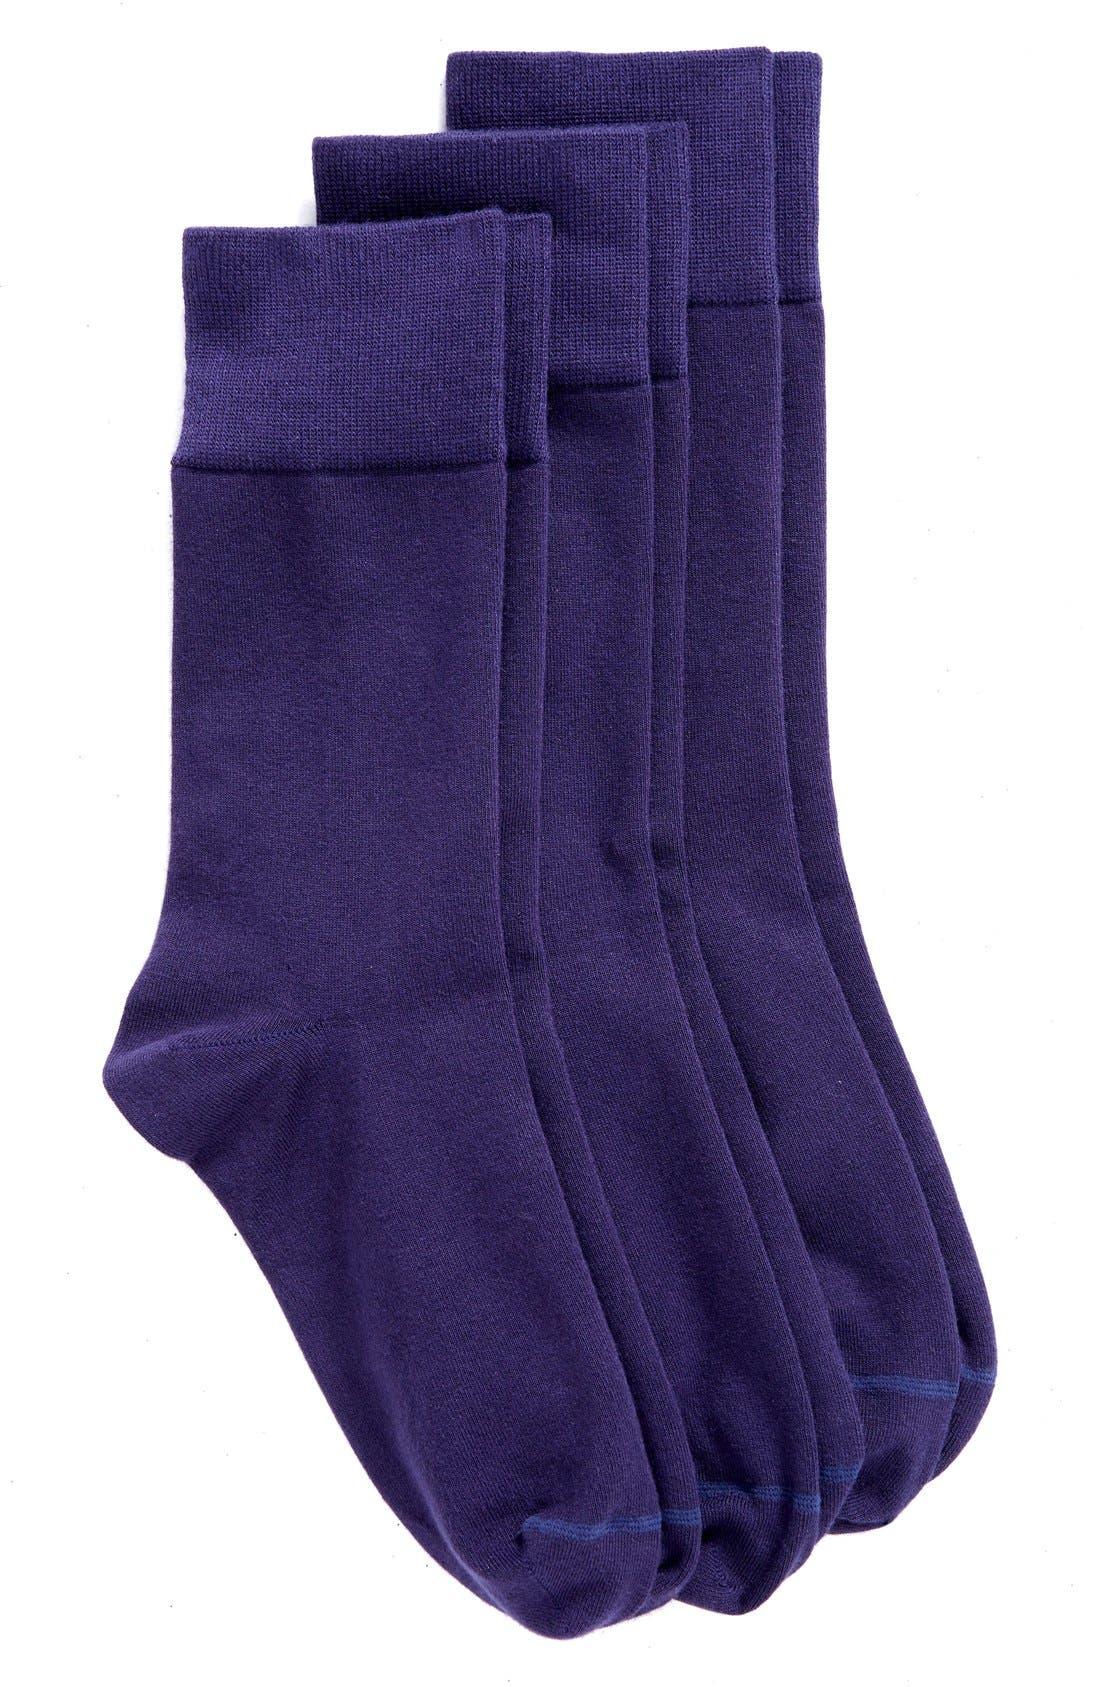 Crew Socks,                         Main,                         color, NAVY